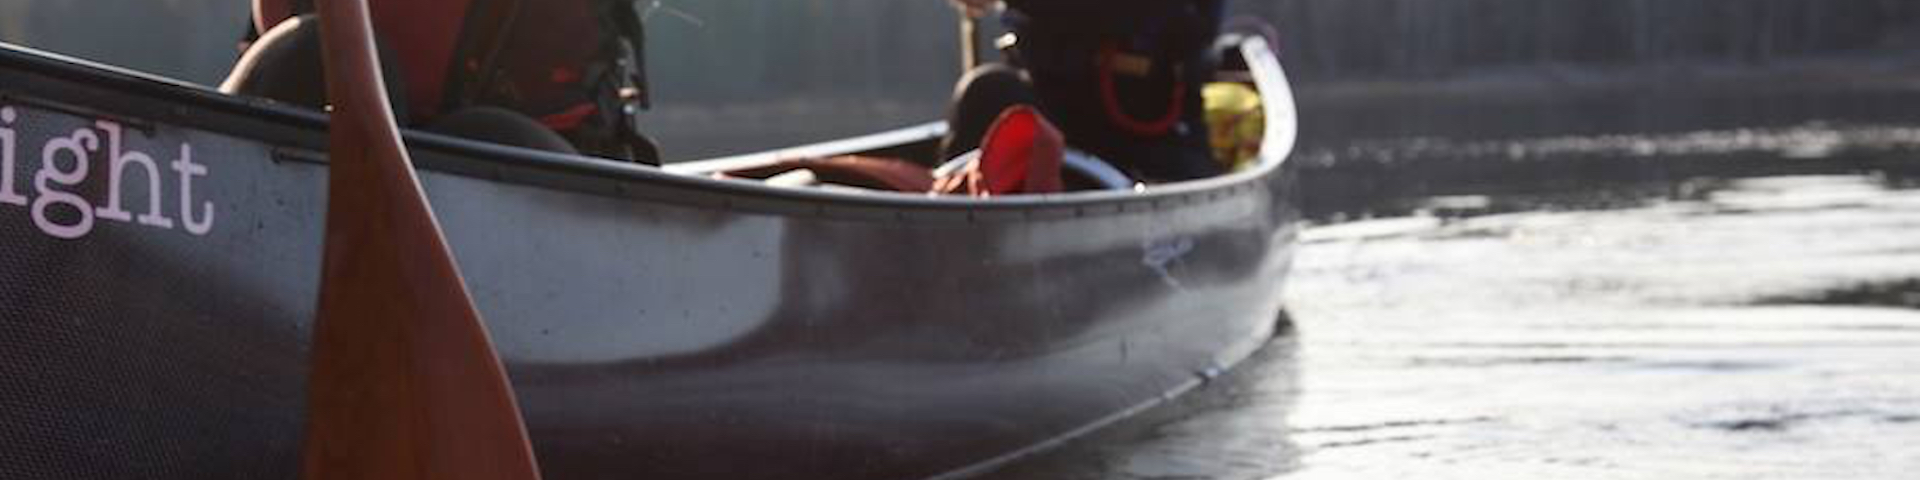 Canoe Paddles: Ripple by Echo Paddles - Image 4478